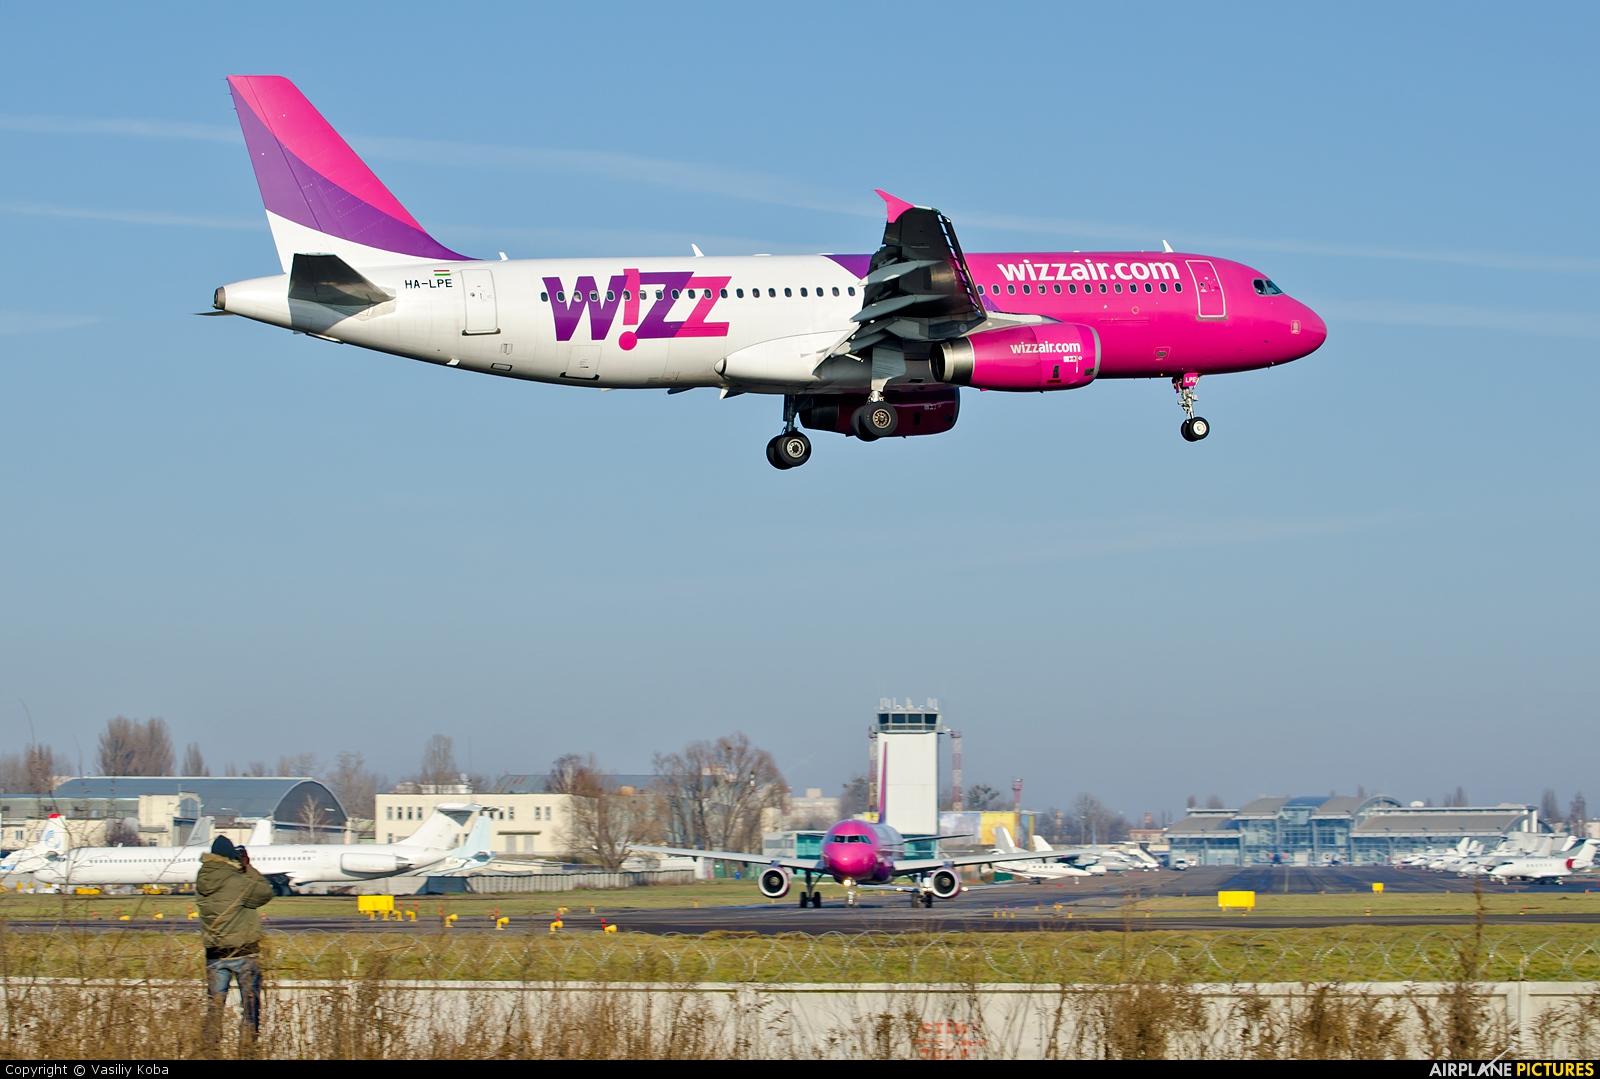 Wizz Air HA-LPE aircraft at Kyiv - Zhulyany